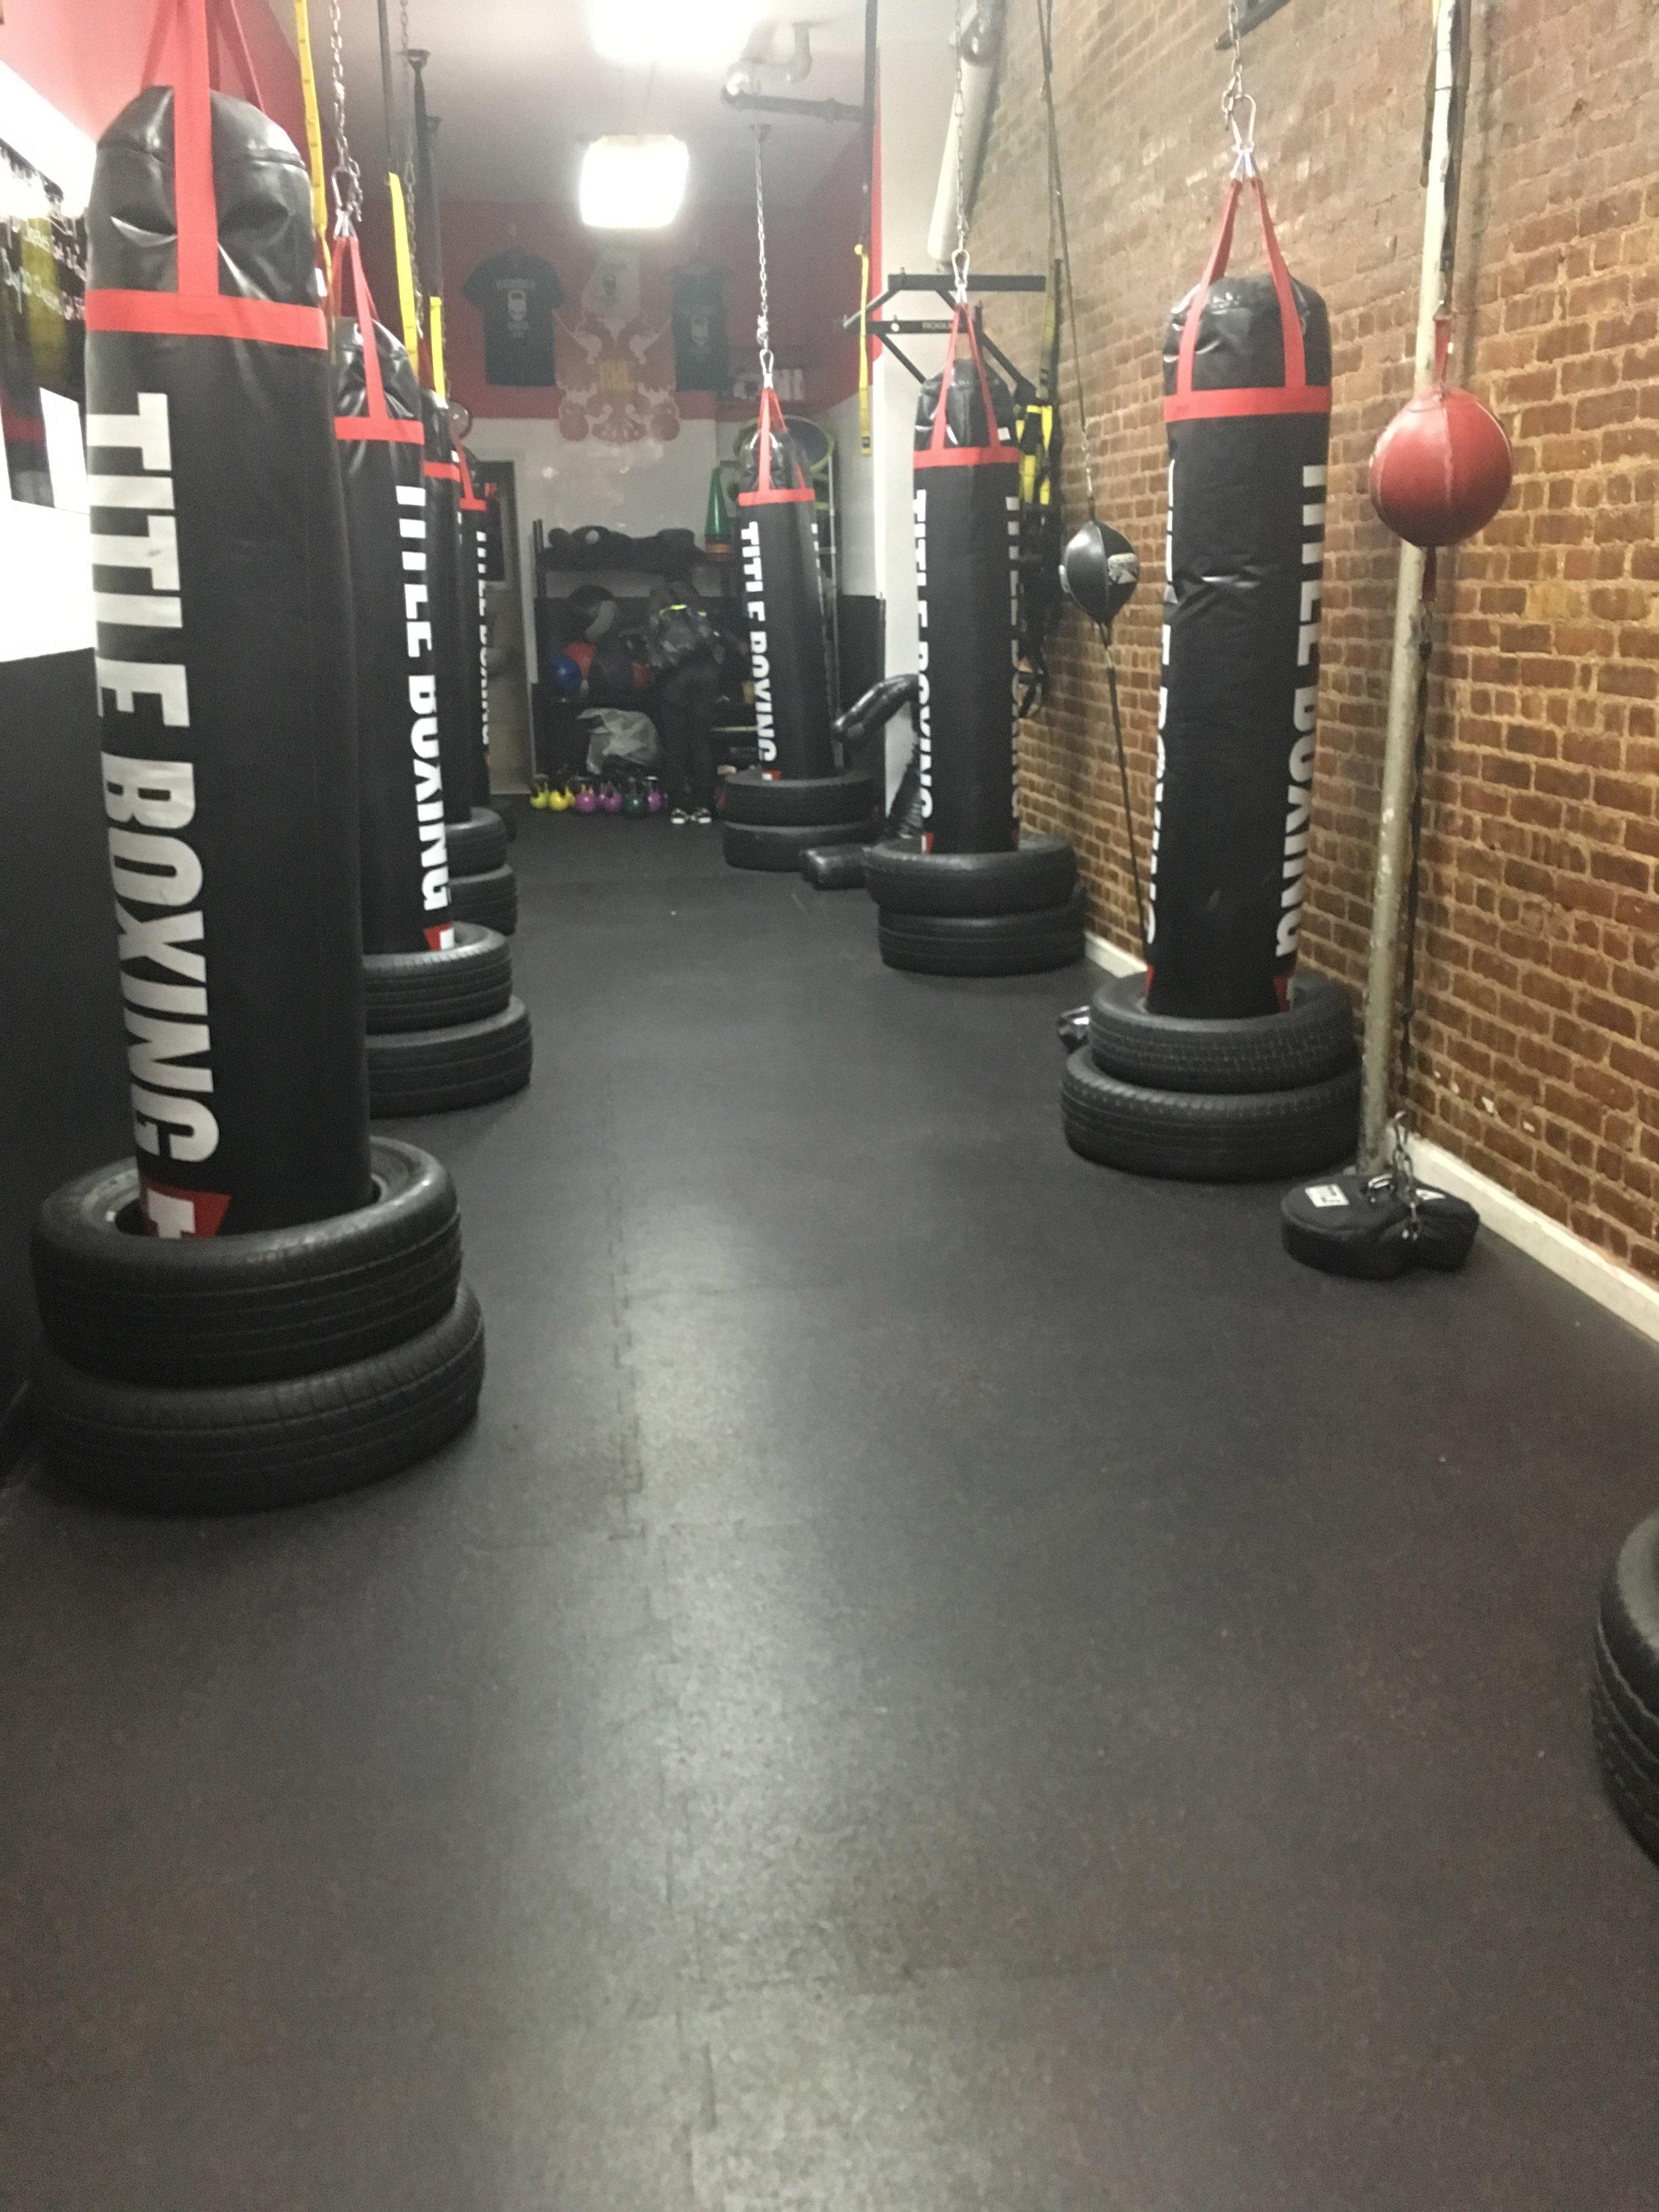 Kickbox Haus NYC